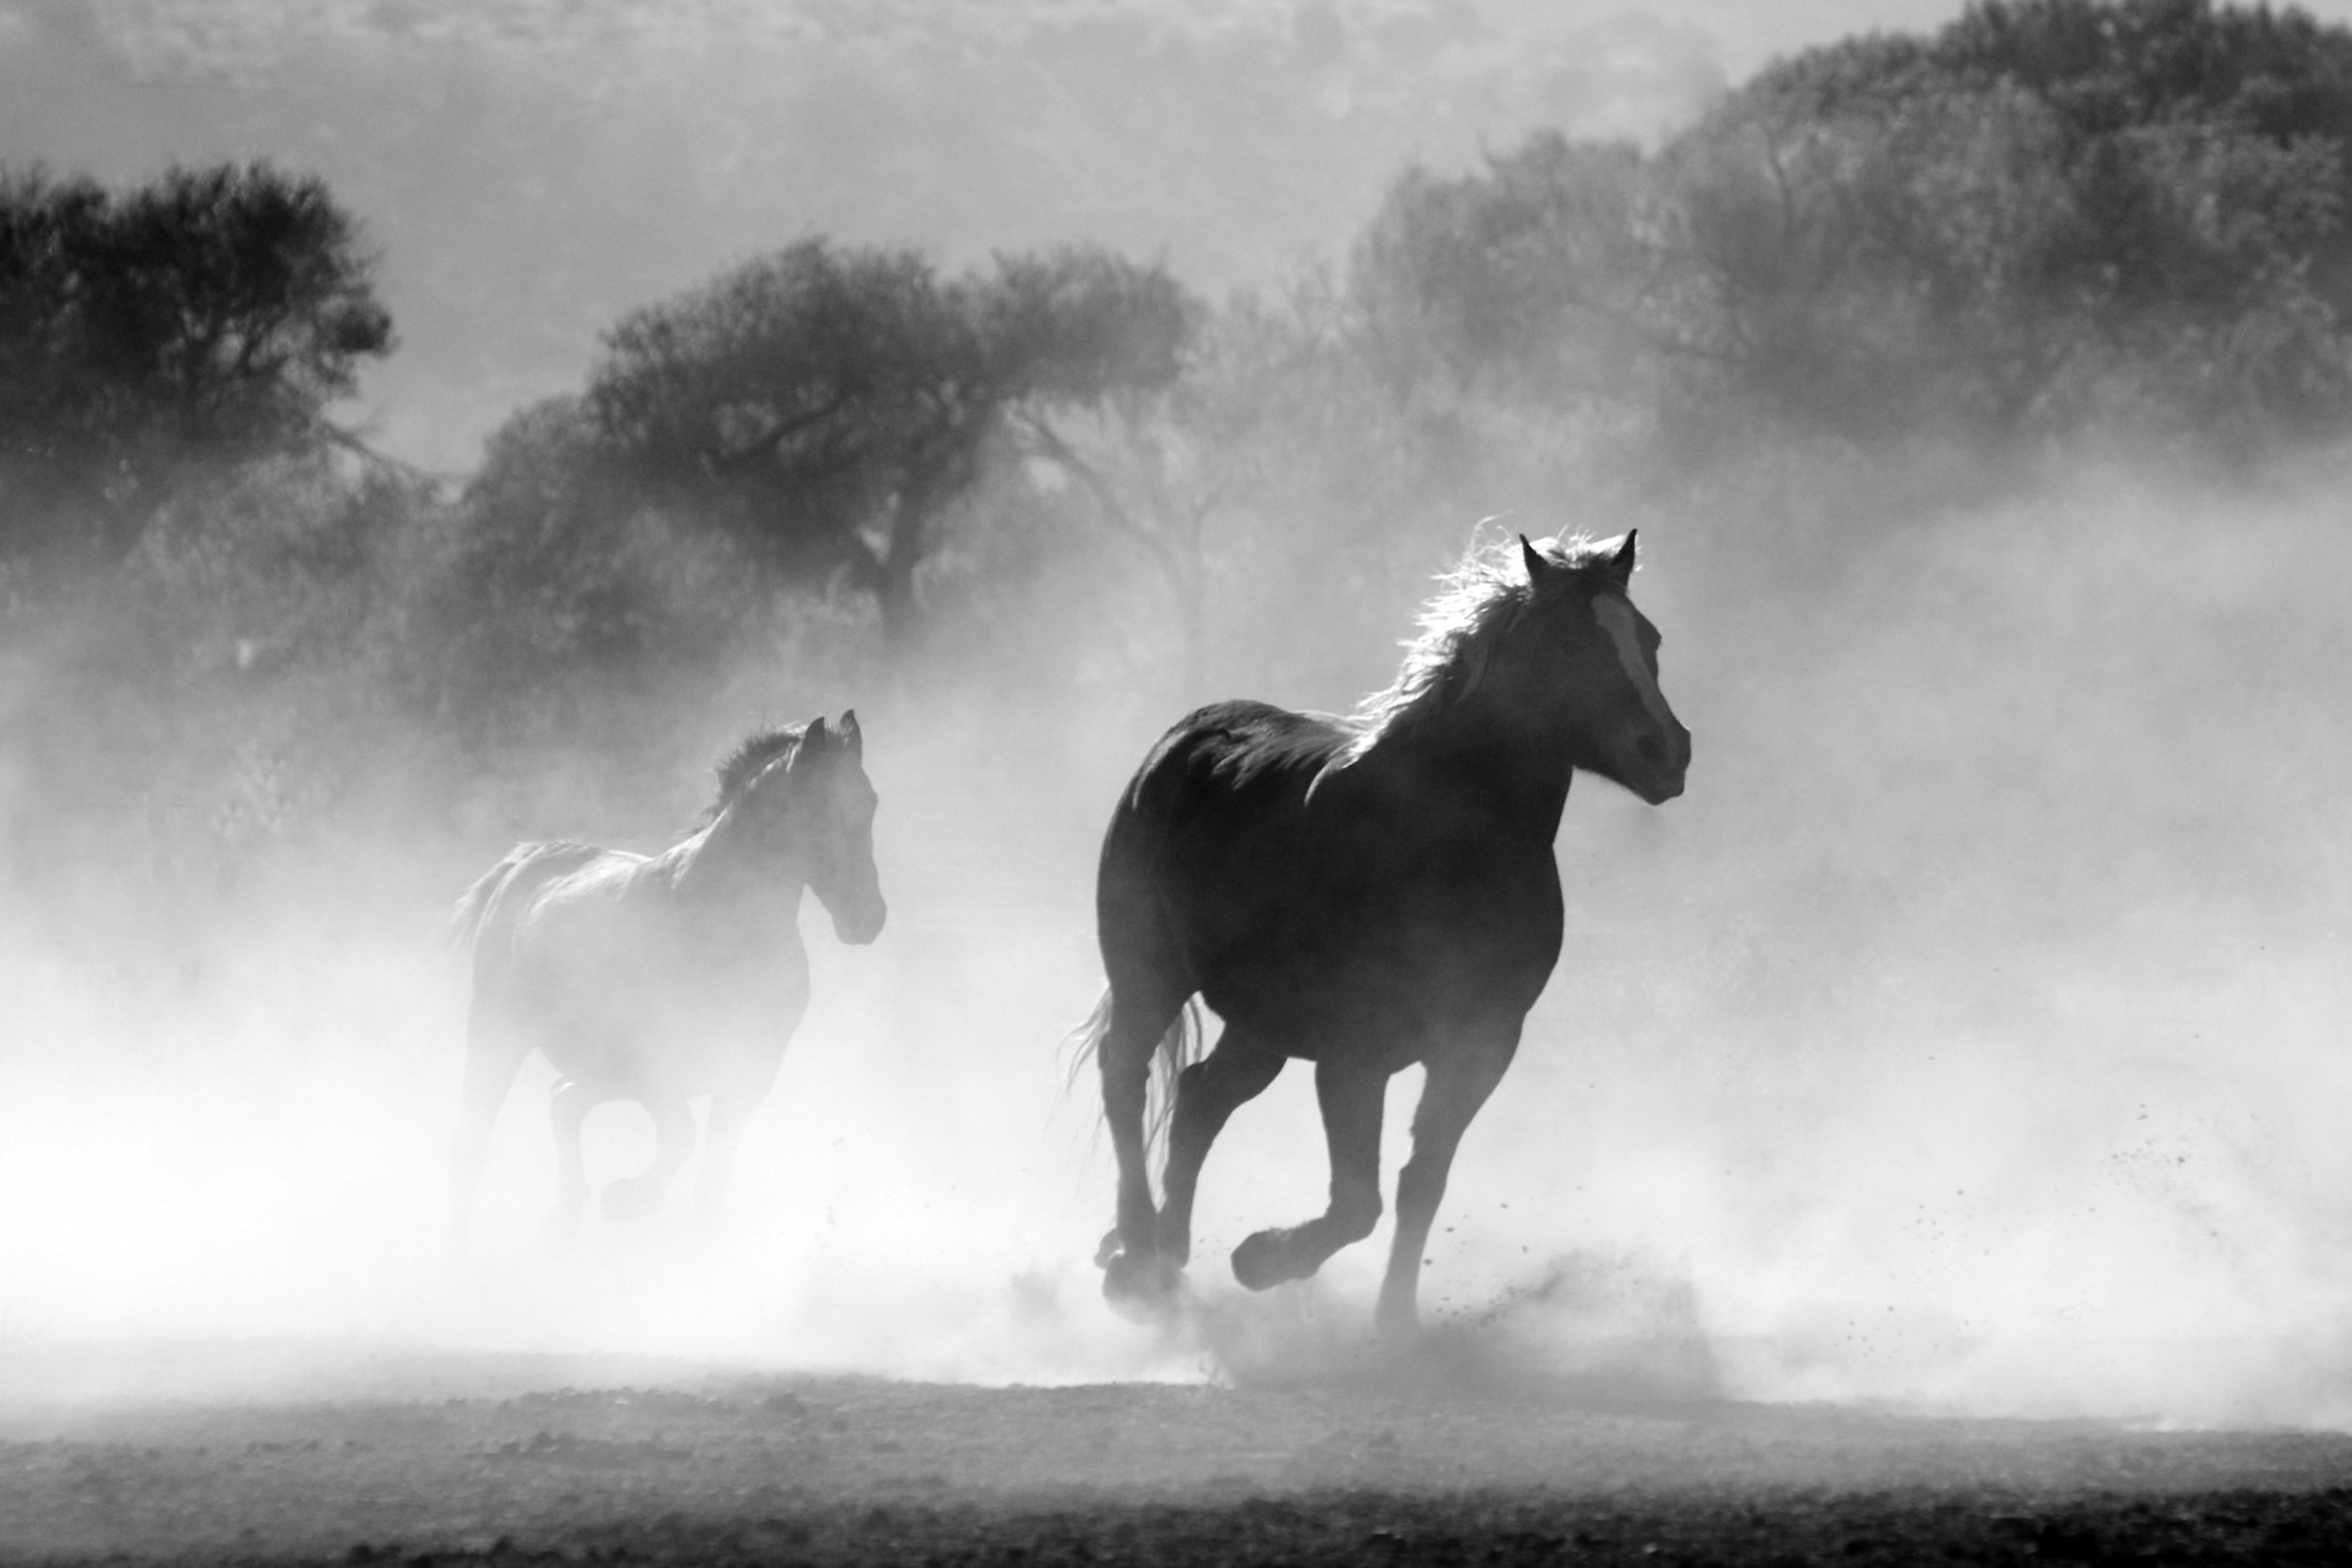 animals-black-and-white-equine-52500.jpg